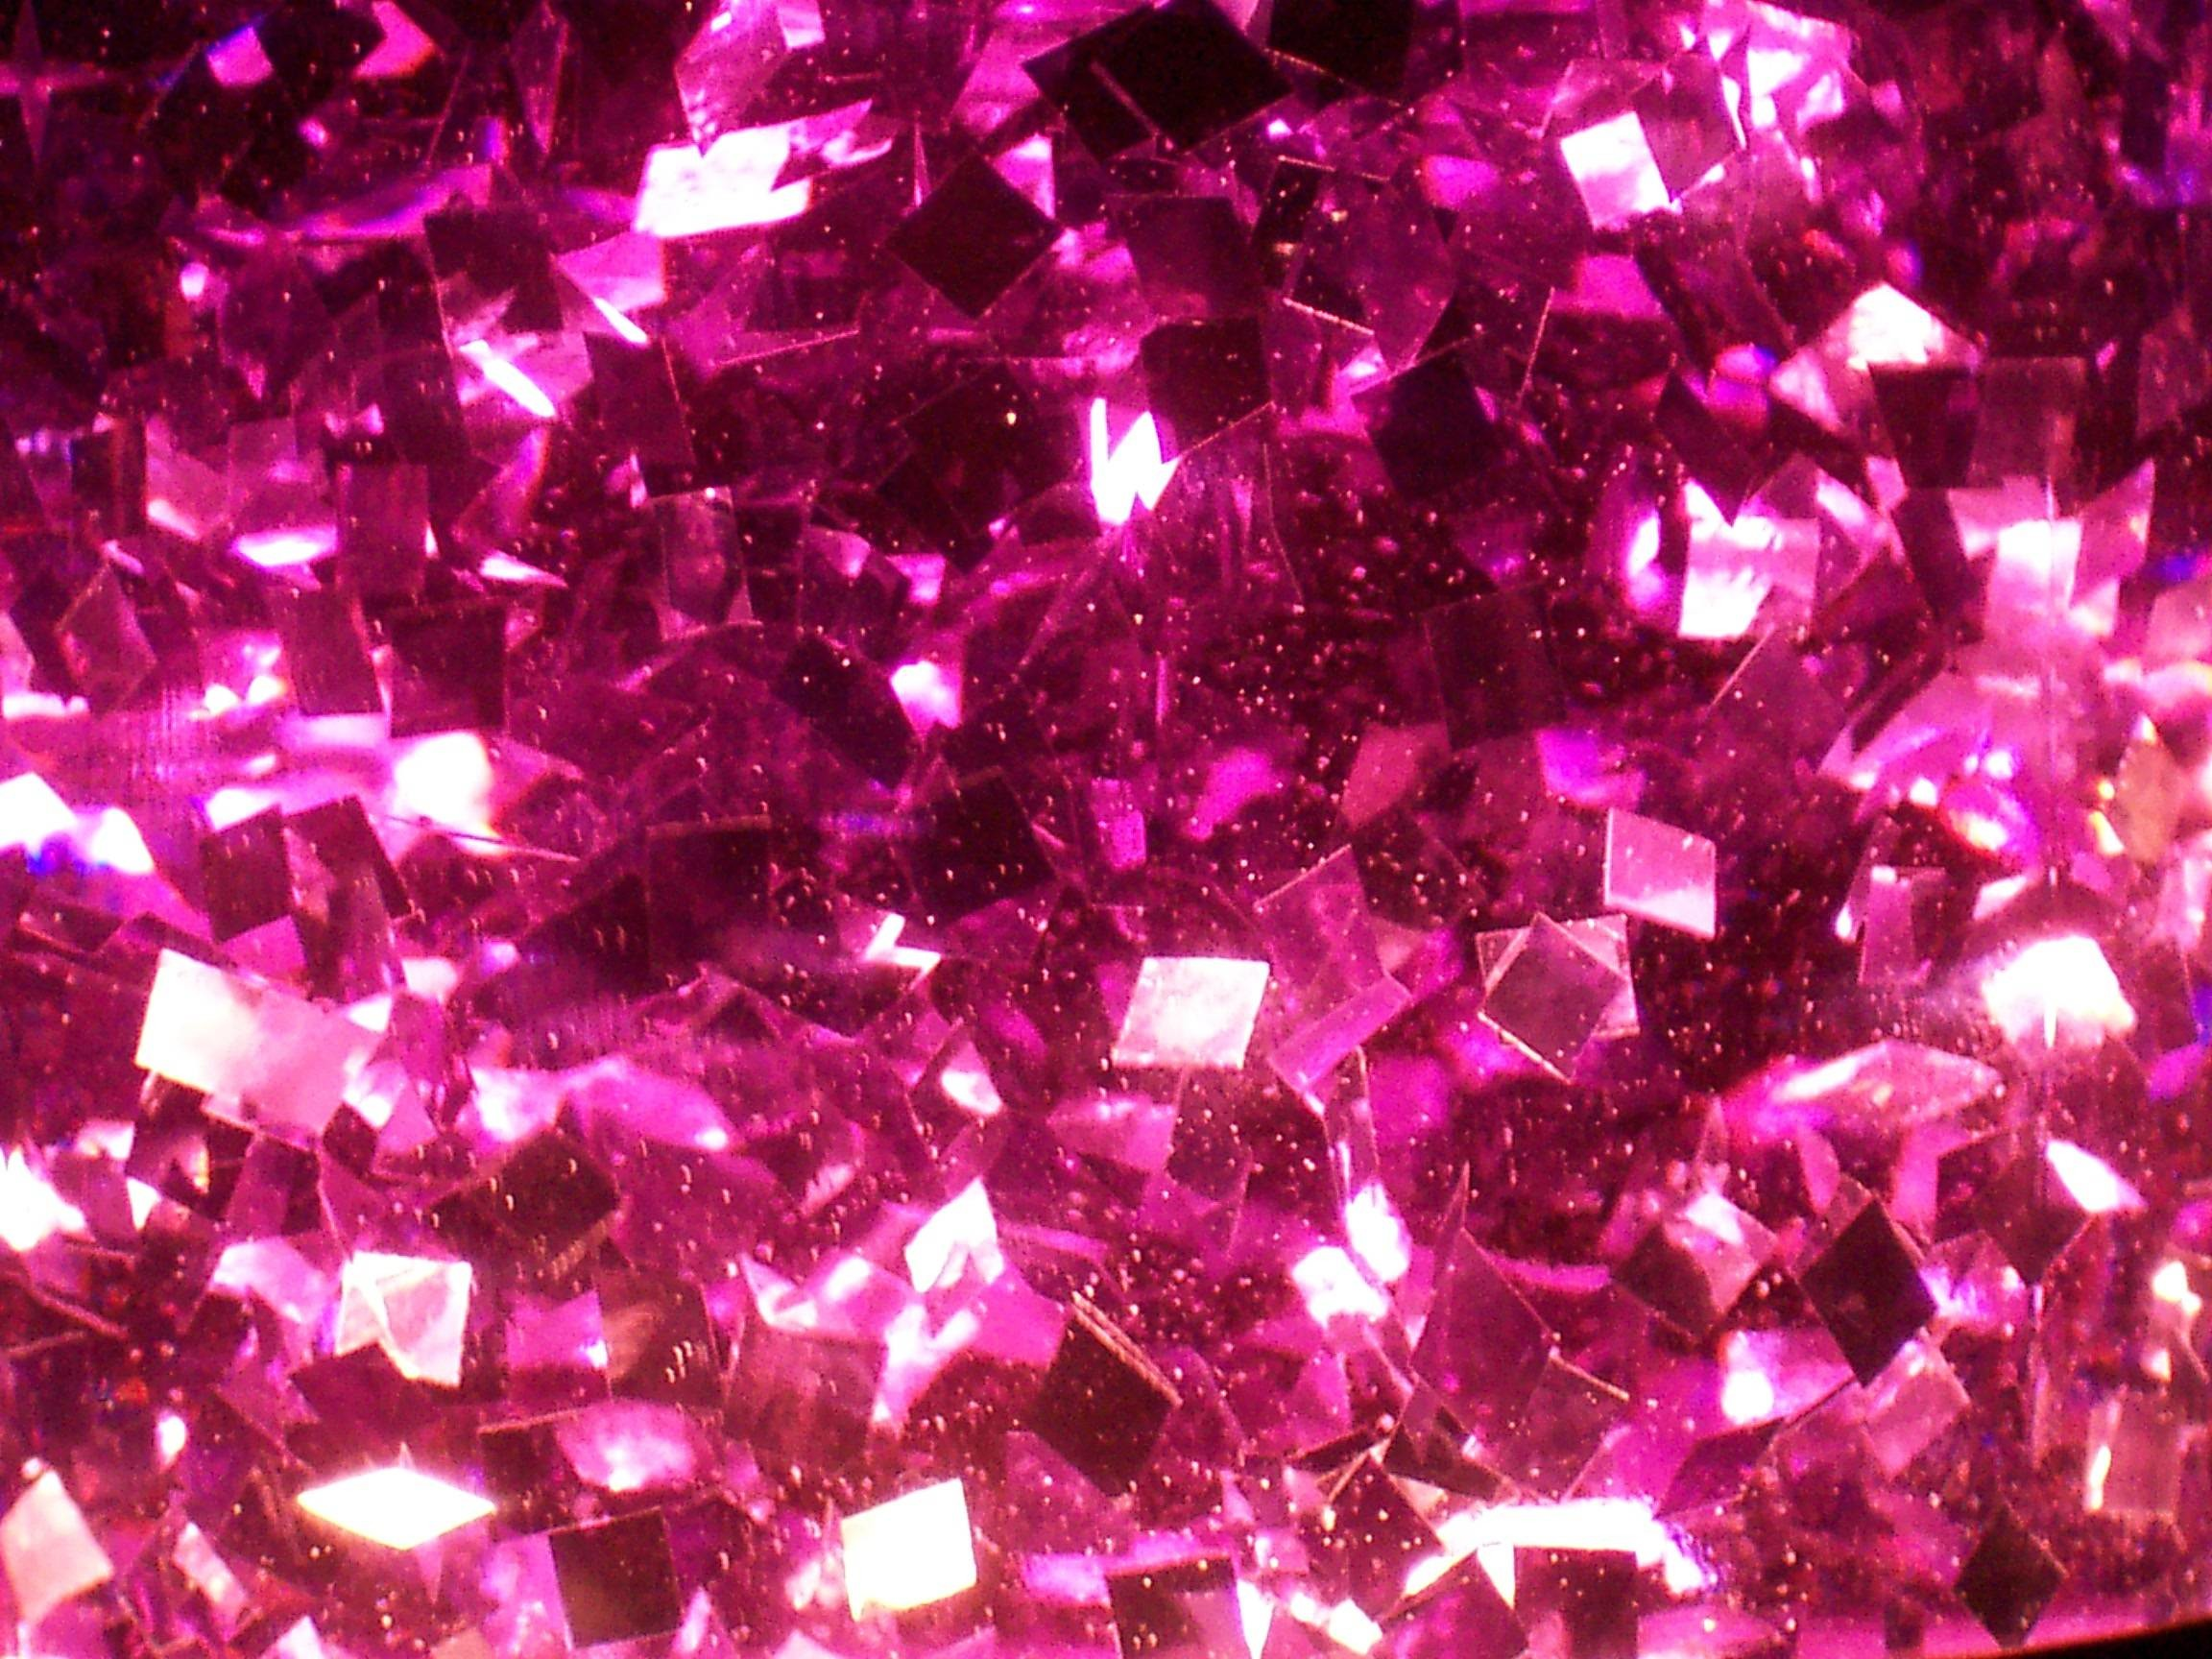 Res: 2304x1728, Pink Glitter Desktop Wallpaper (p.188-IL) - ModaF.com